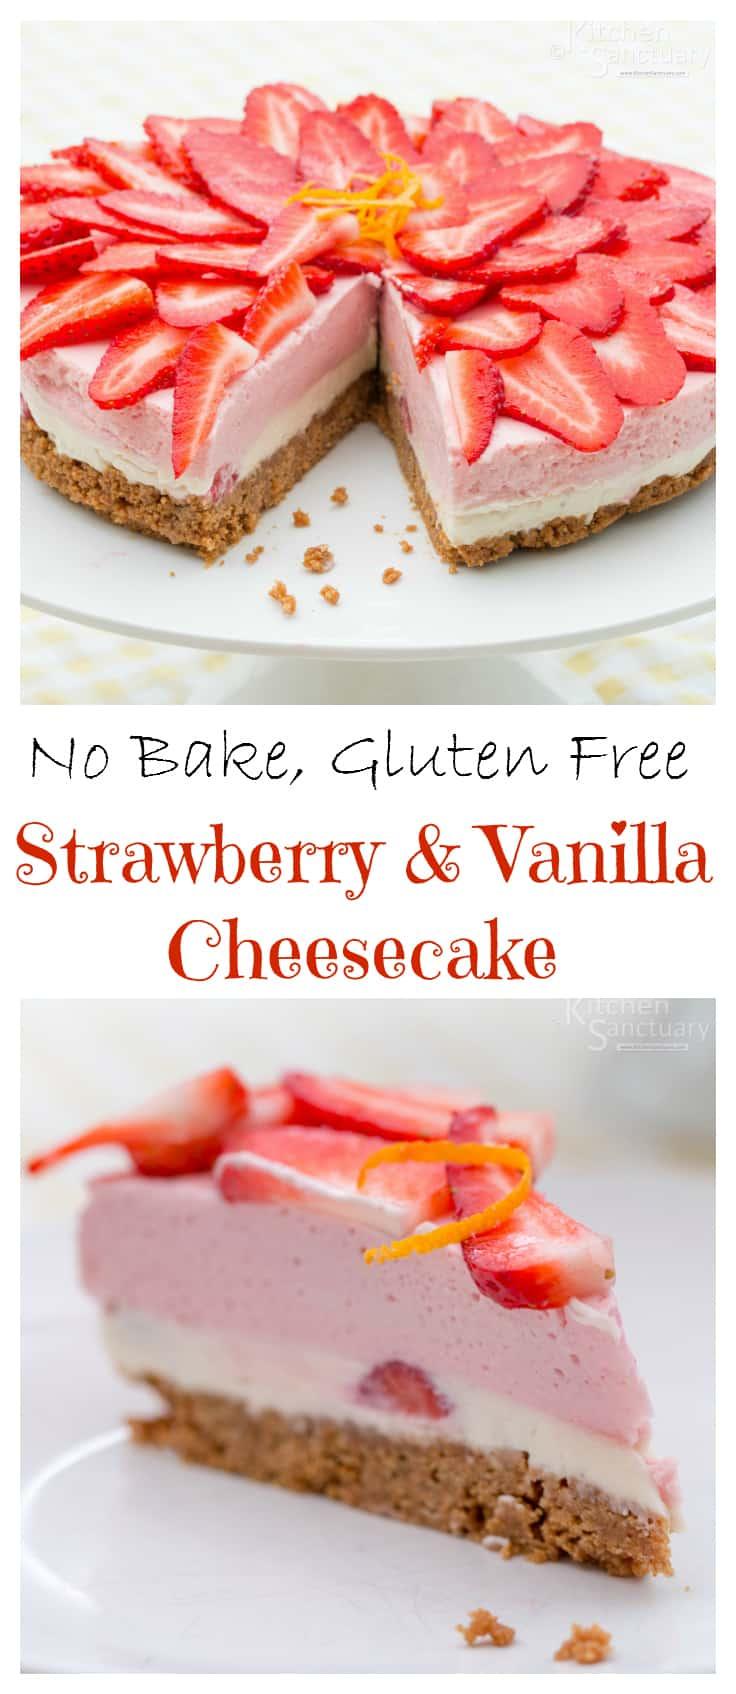 Strawberry and Vanilla Cheesecake - a delicious no-bake, gluten free dessert!